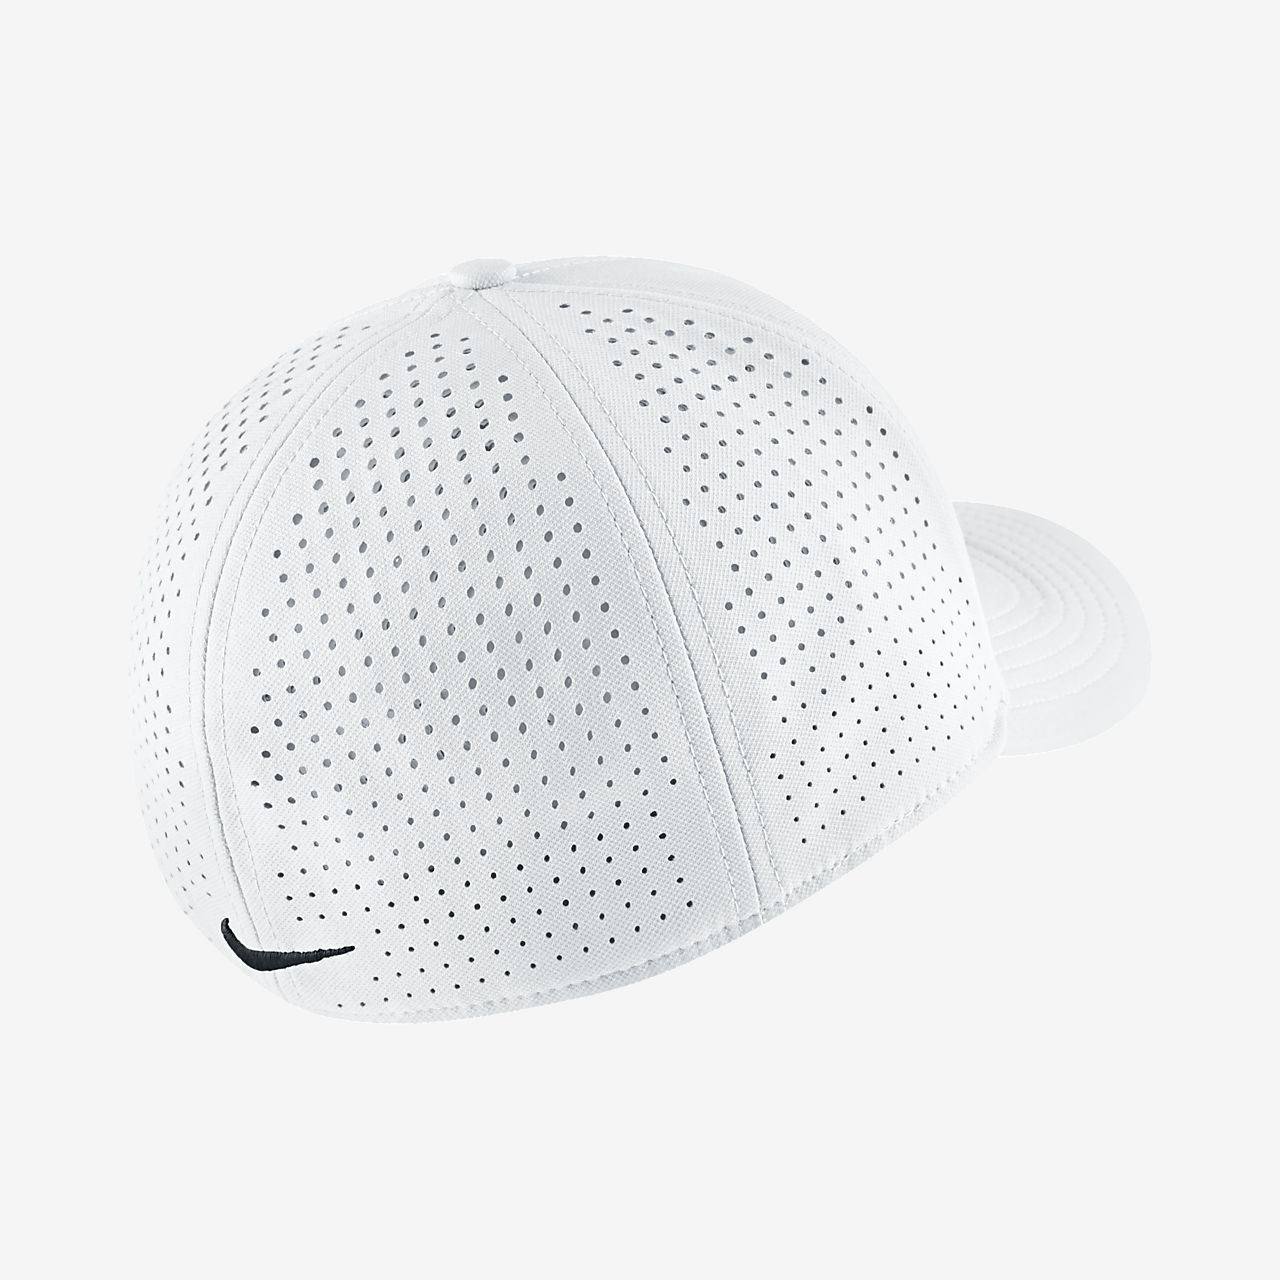 faa9a3e5 Nike Vapor Classic 99 SF Fitted Hat. Nike.com GB